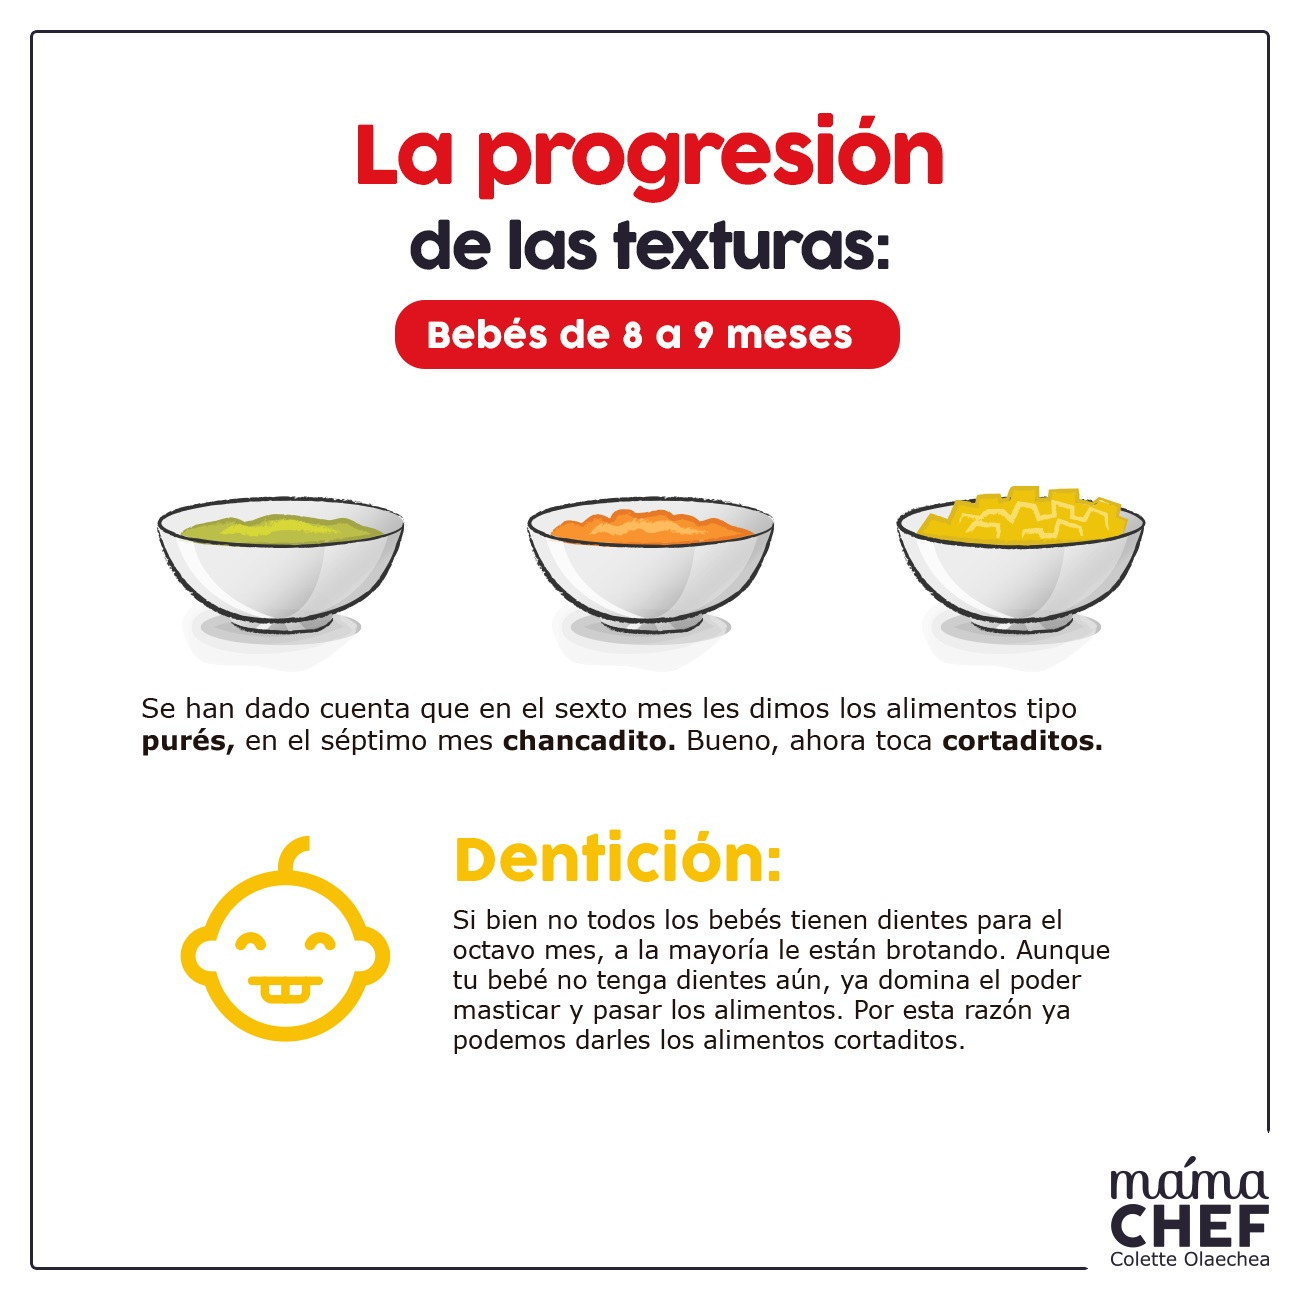 recomendaciones mamá chef- colette olaechea  papillas bebes 8 meses